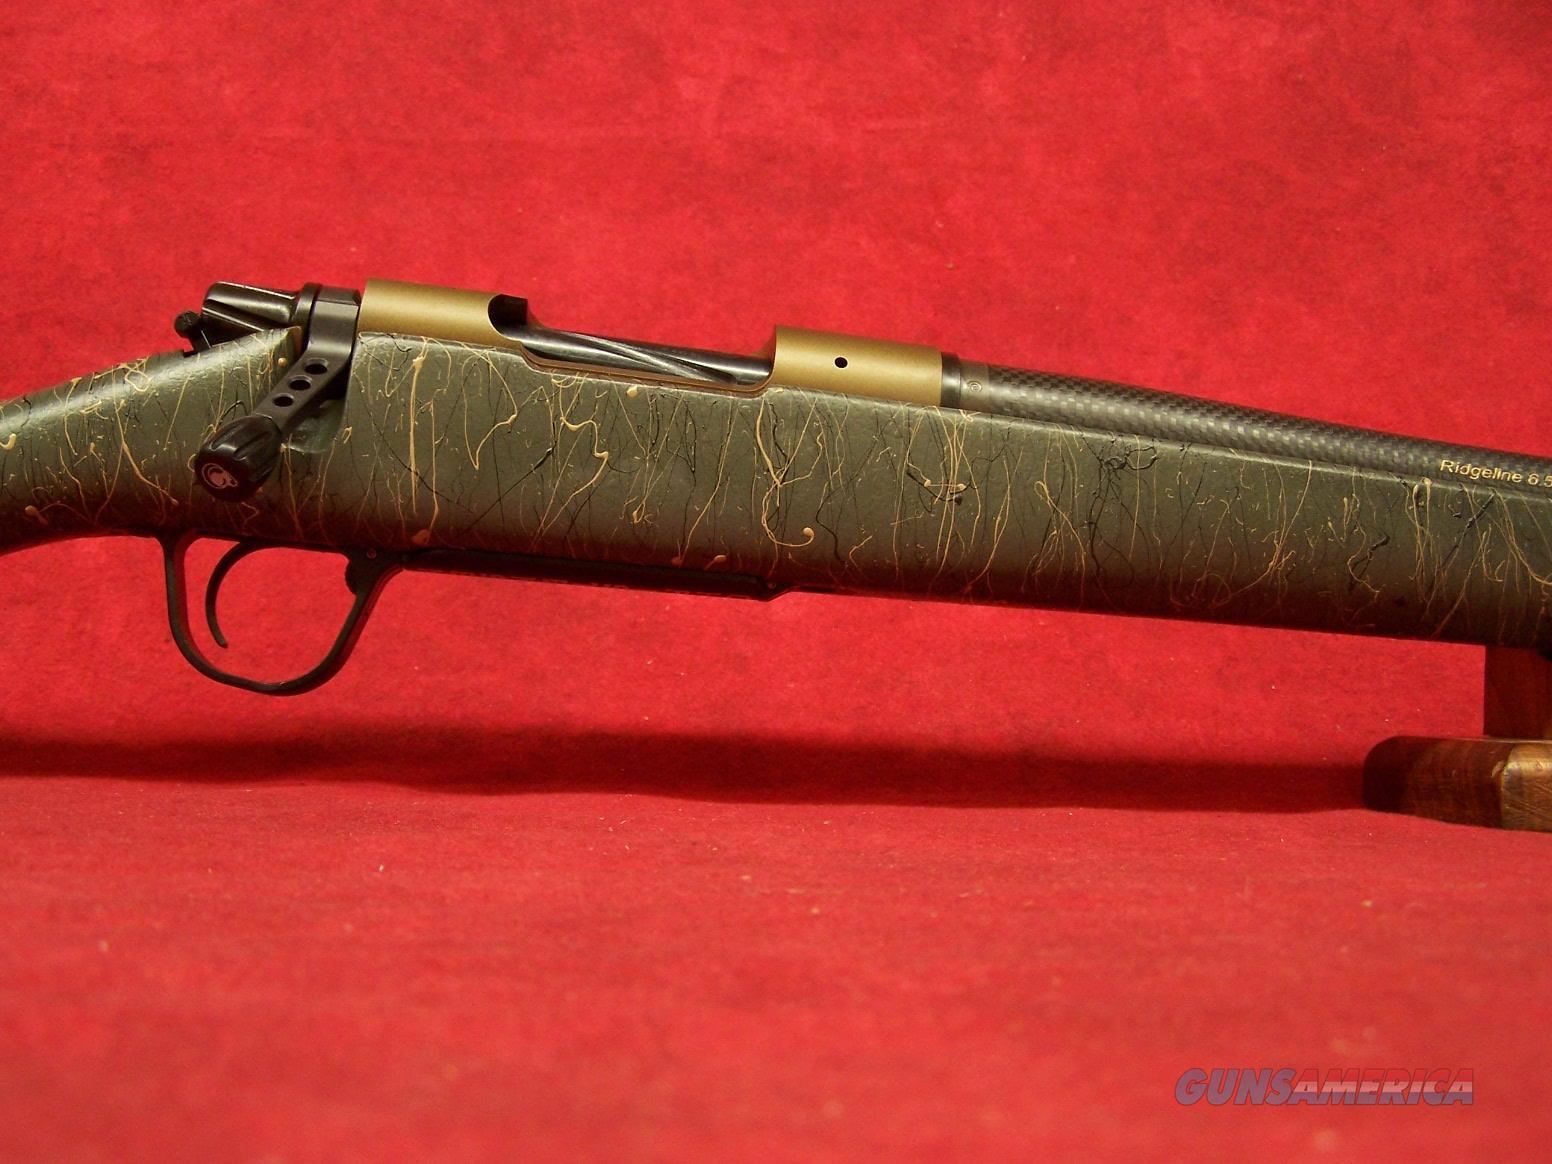 "Christensen Arms Ridgeline 6.5 PRC Bronze with Green / Black & Tan Web Stock 24"" carbon barrel plus brake 1:8 twist  Guns > Rifles > C Misc Rifles"